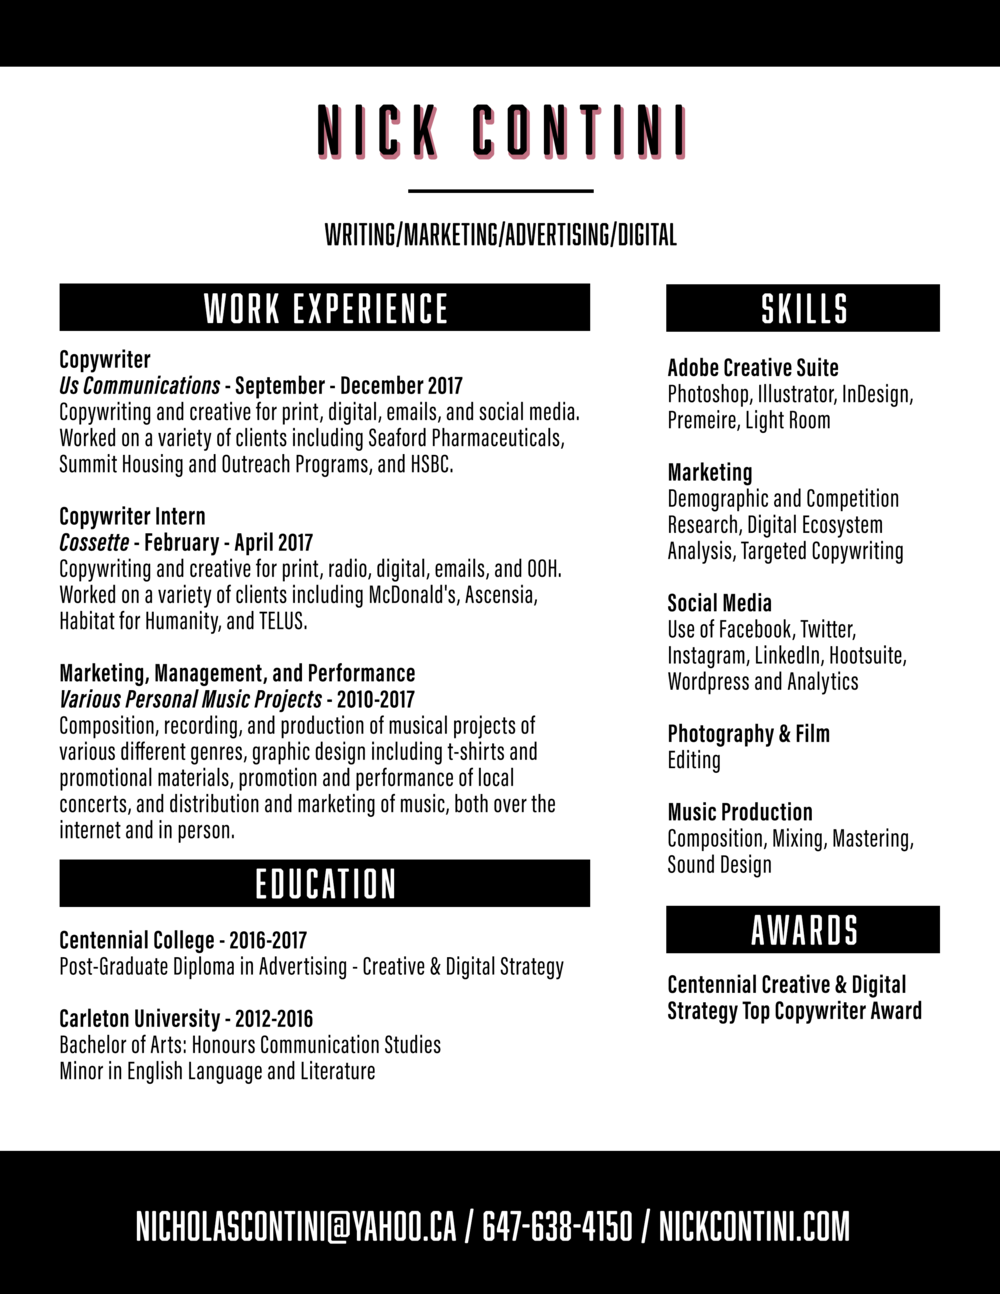 Resume — Nick Contini